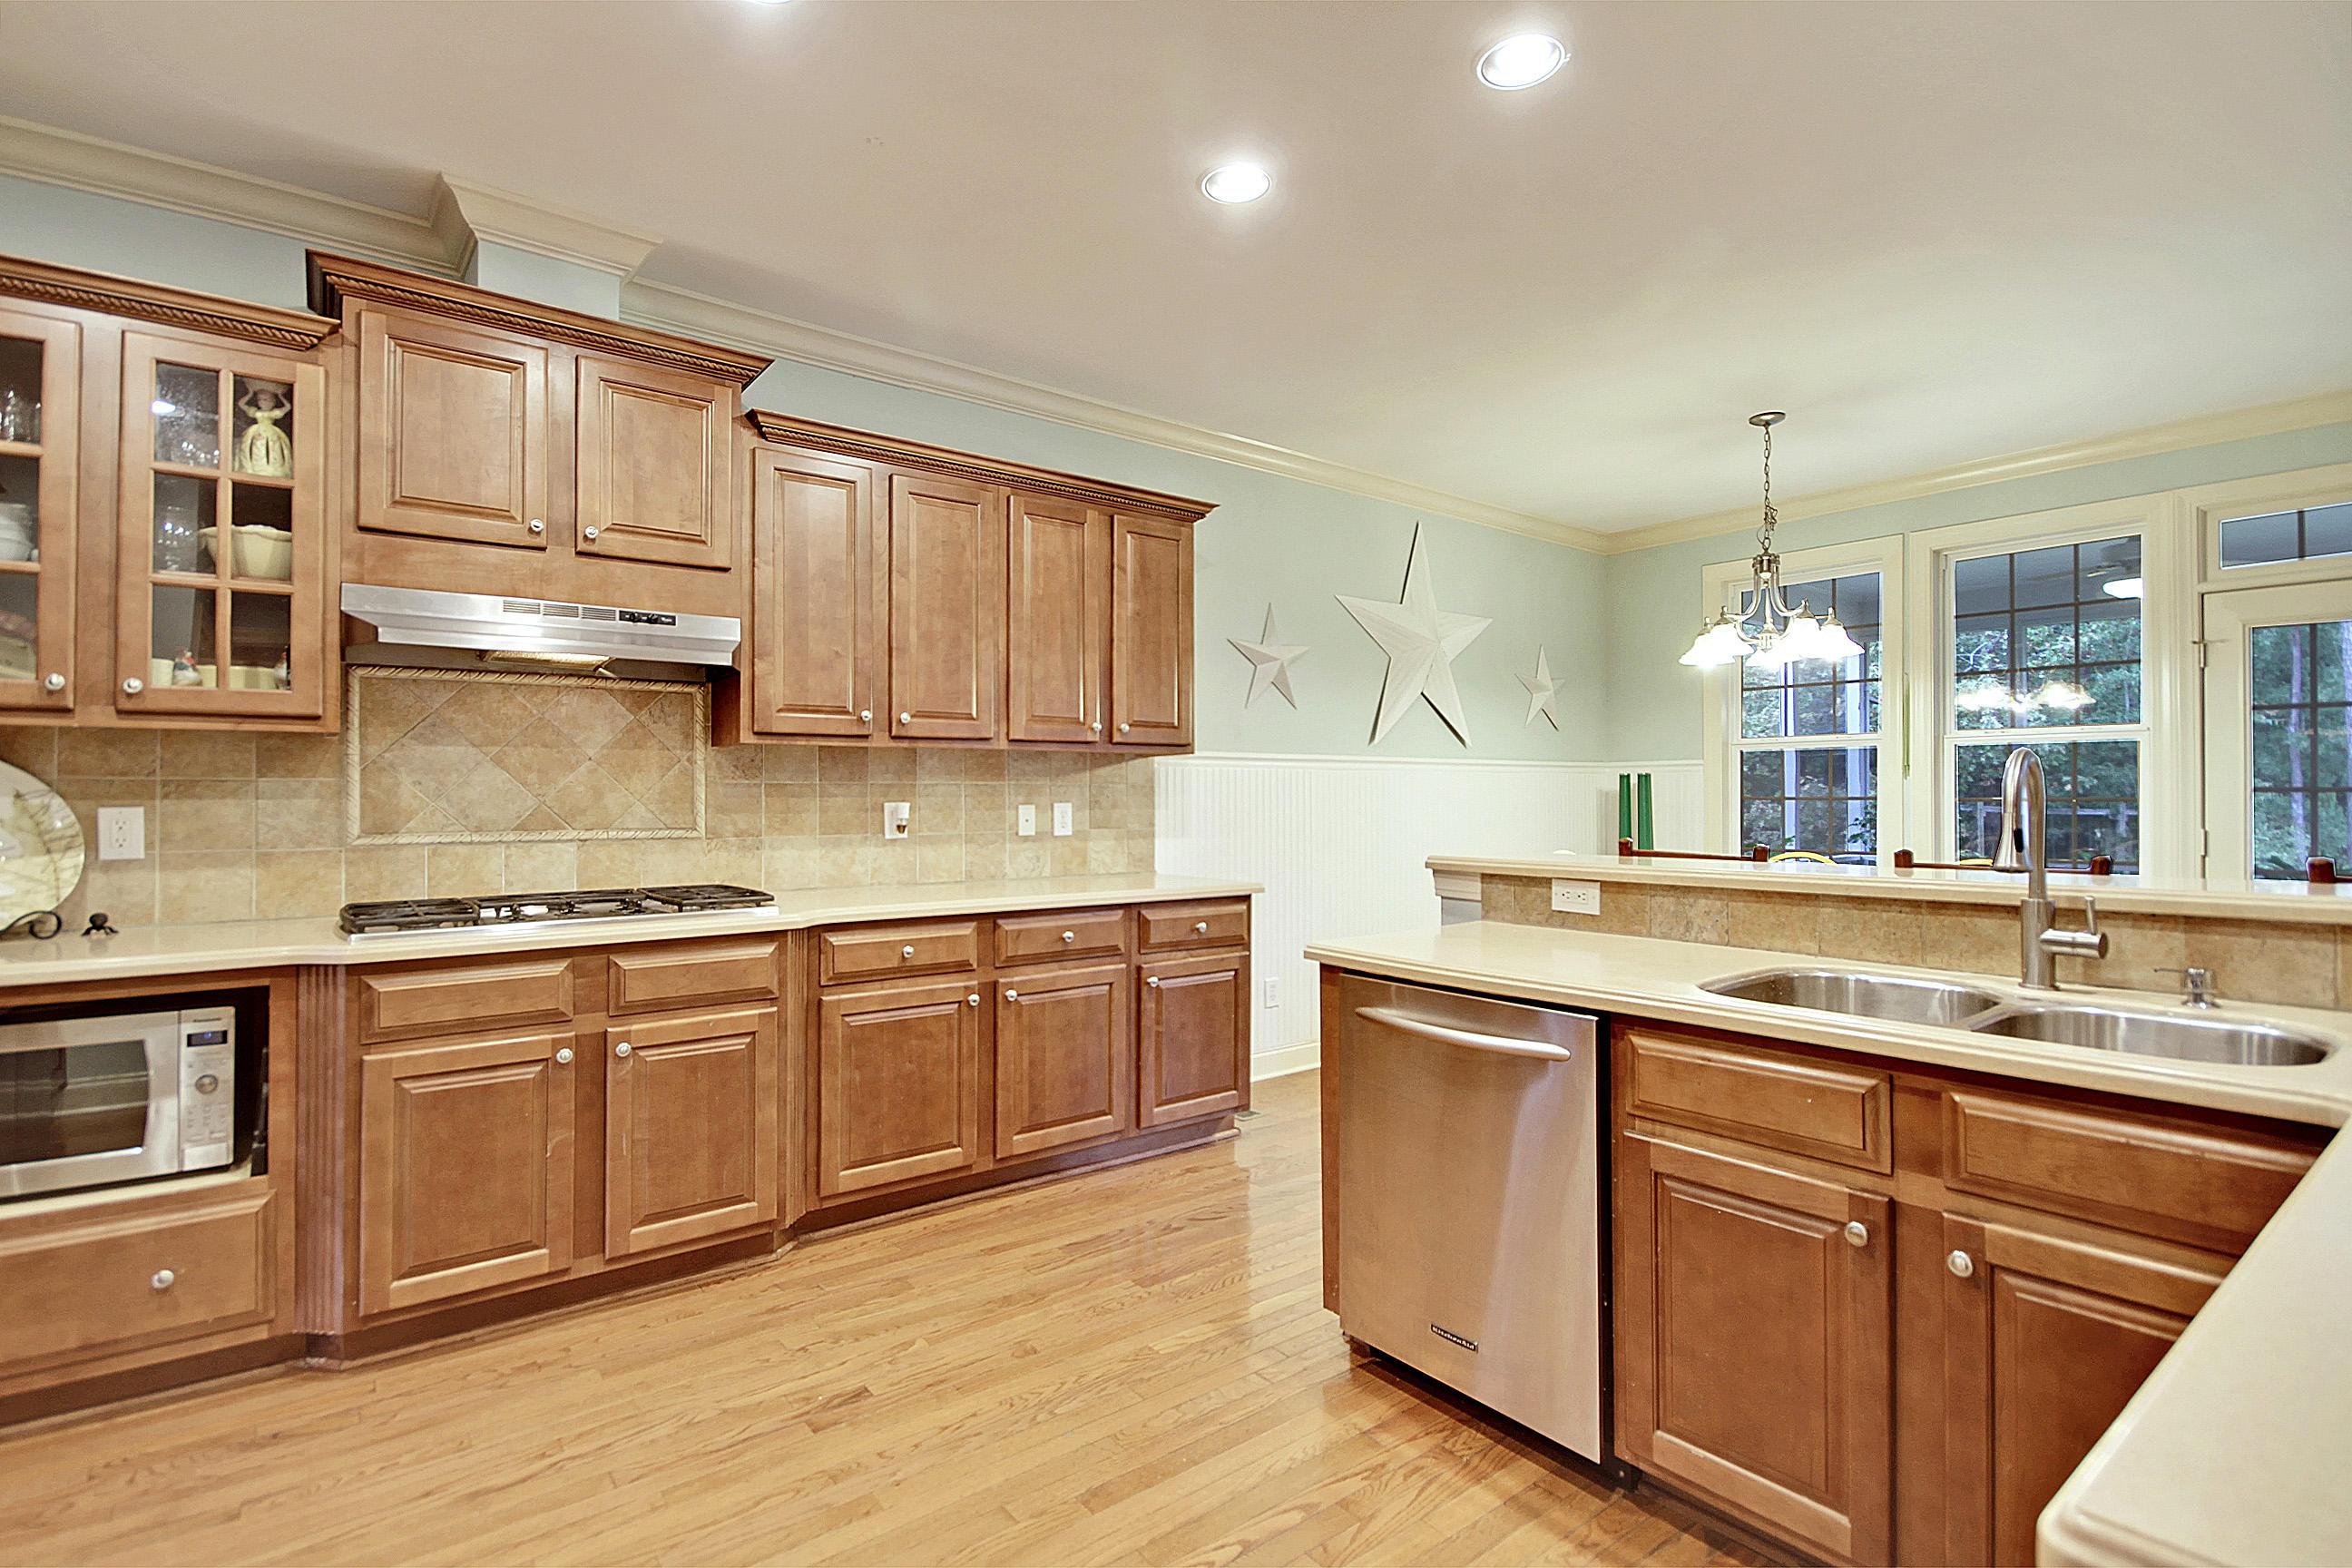 Dunes West Homes For Sale - 2449 Darts Cove, Mount Pleasant, SC - 23